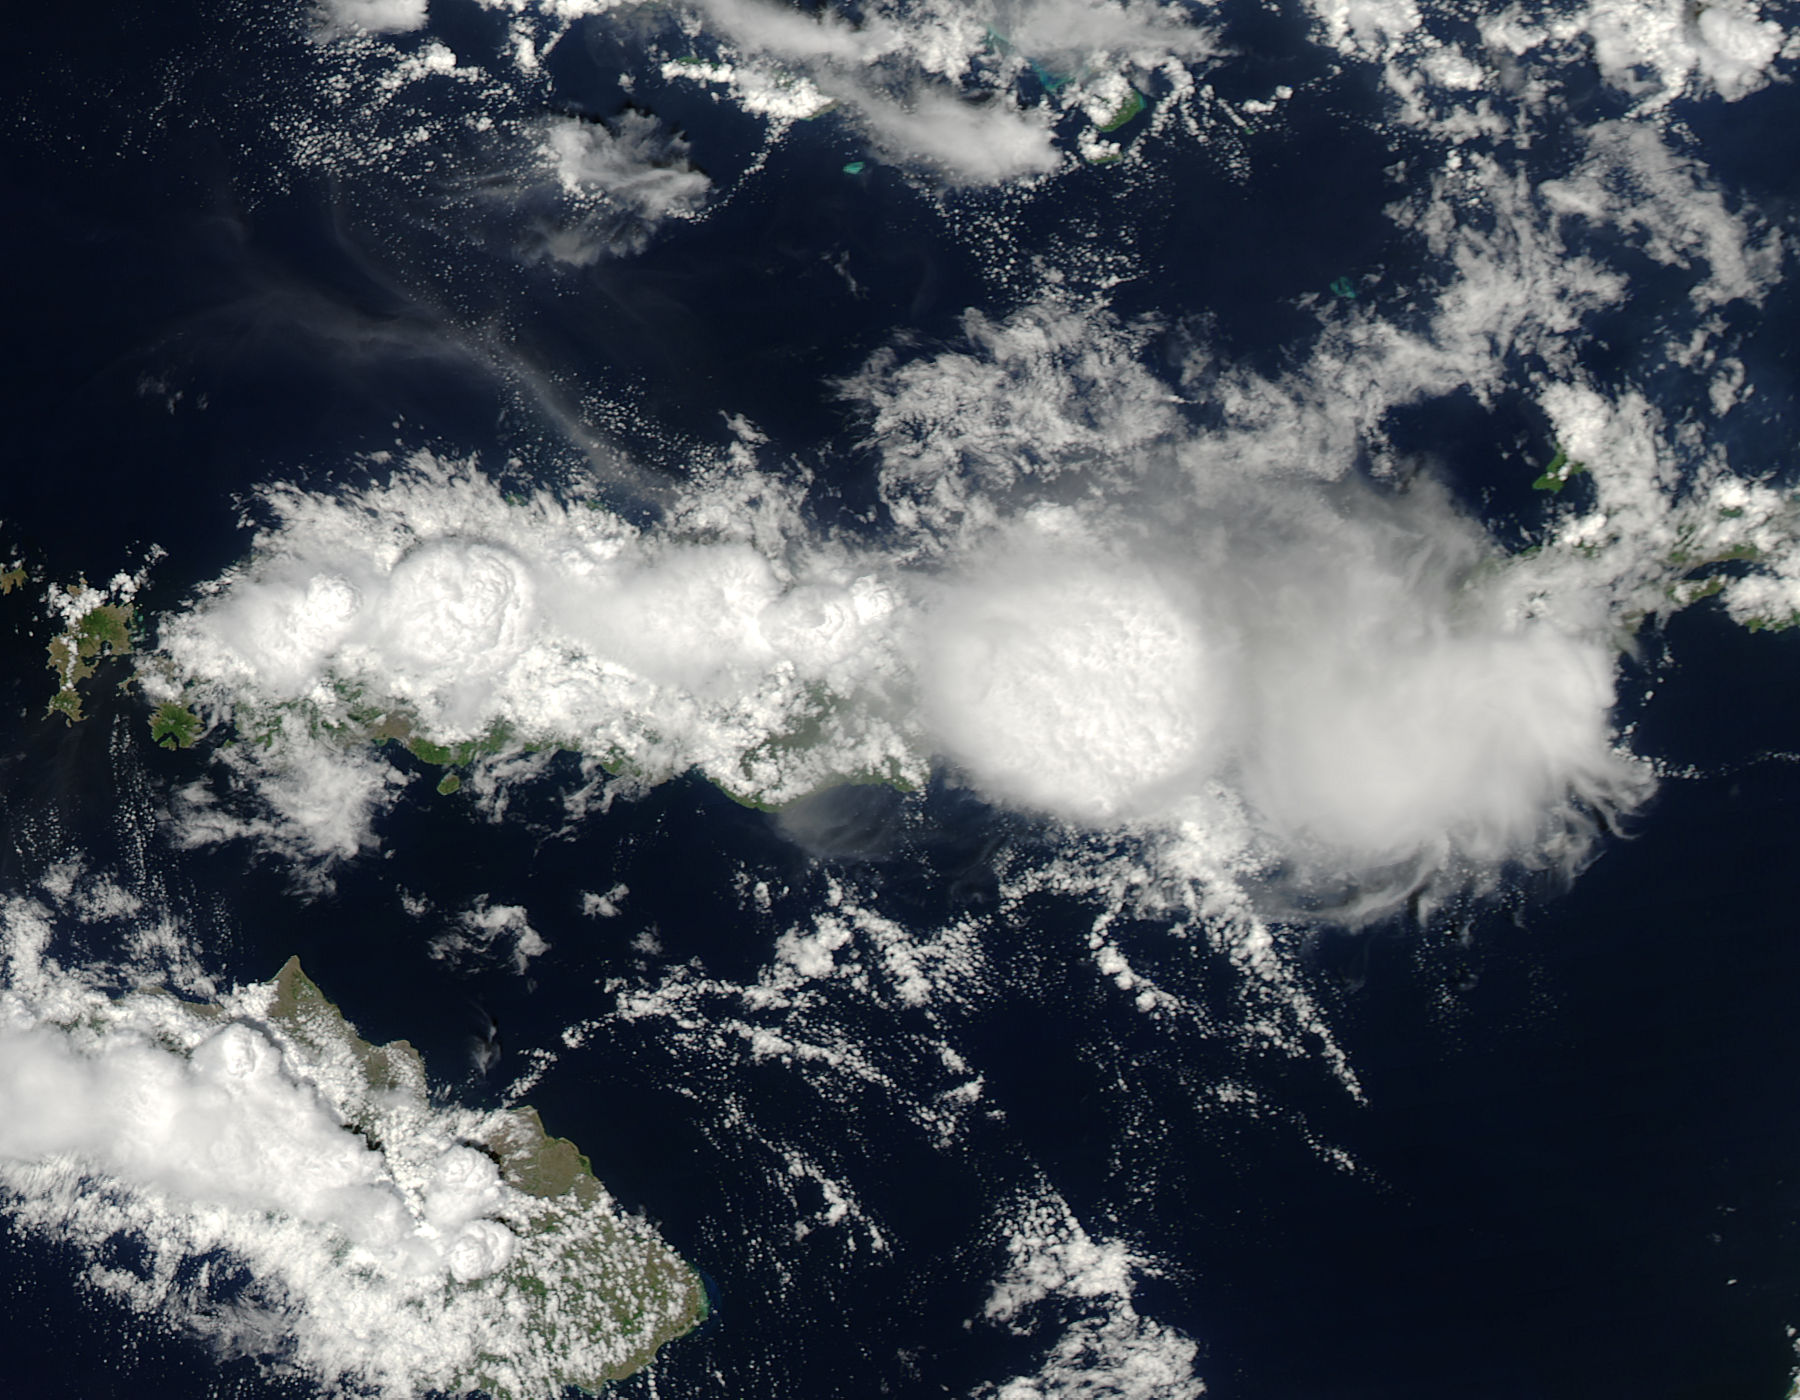 Image Aqua Satellite Captures Striking Cloud Towers - Photos from satellite